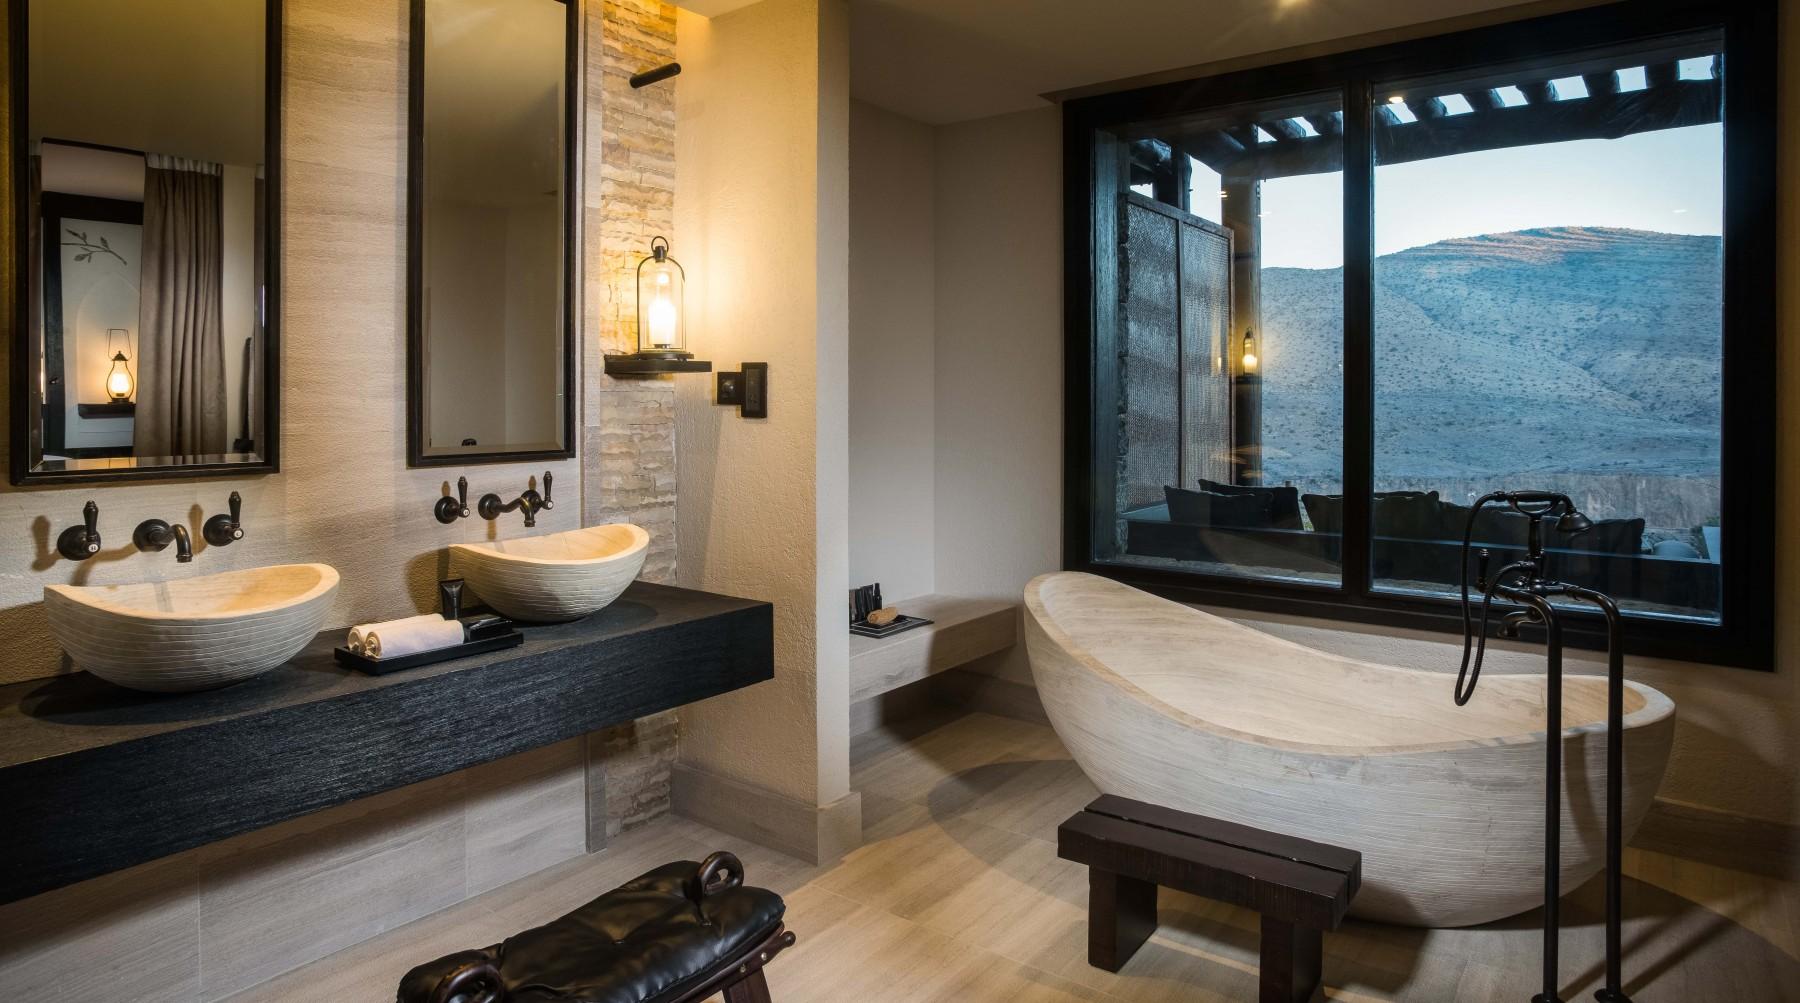 Alila-Jabal-Akhdar-Accommodation-Bathroom-02